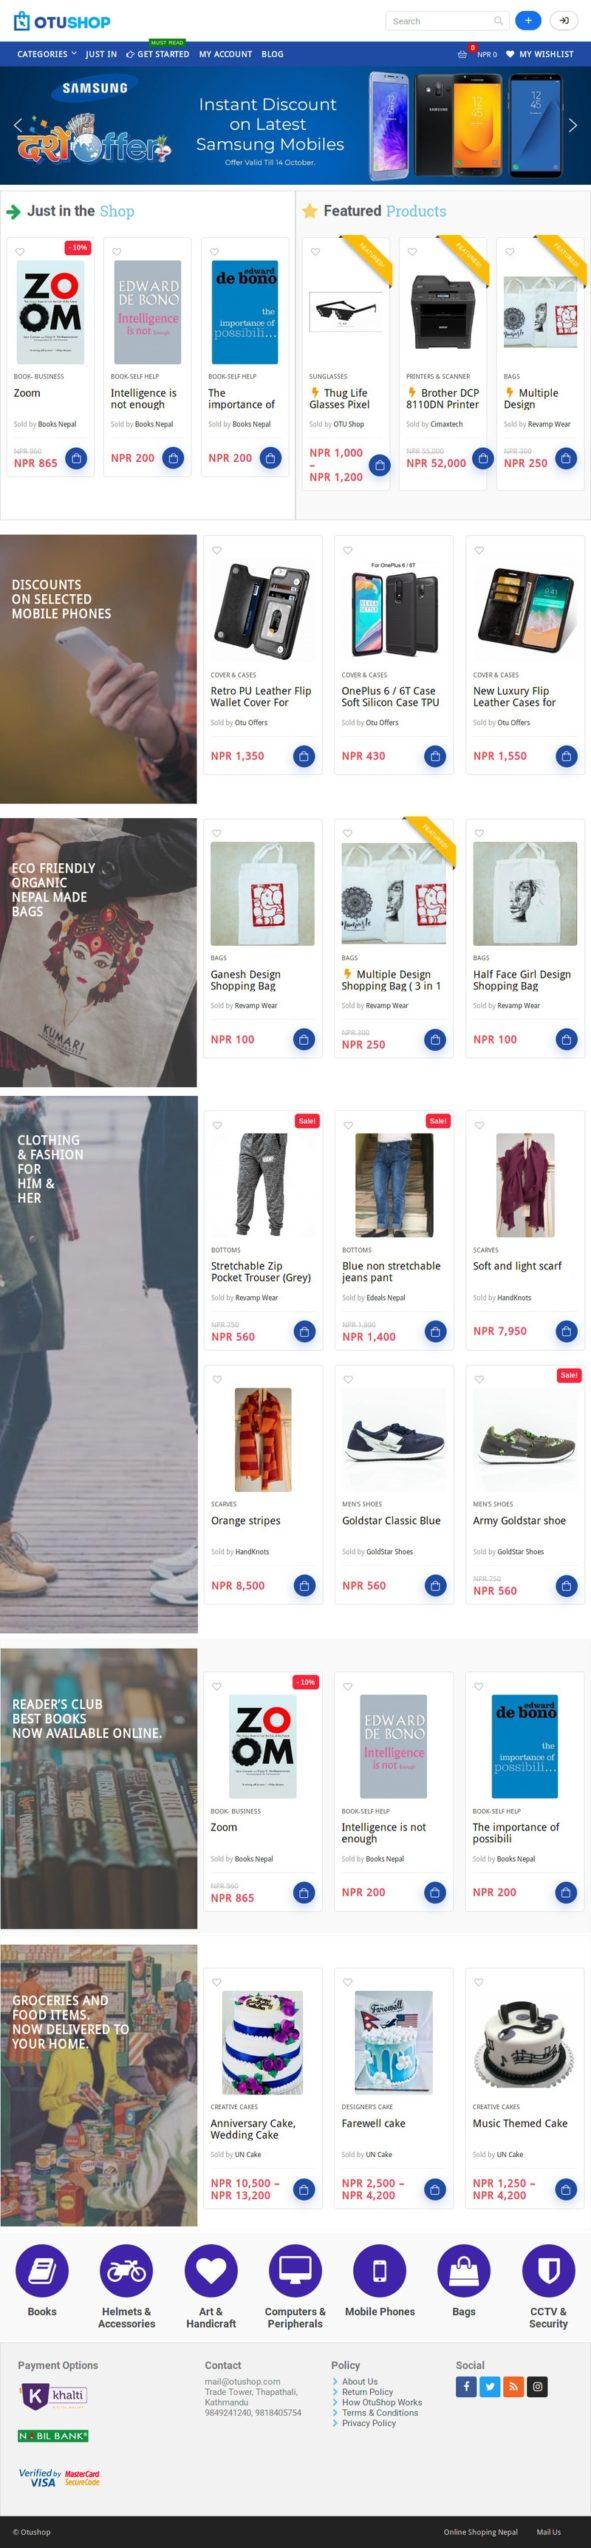 OtuShop.com – eCommerce website